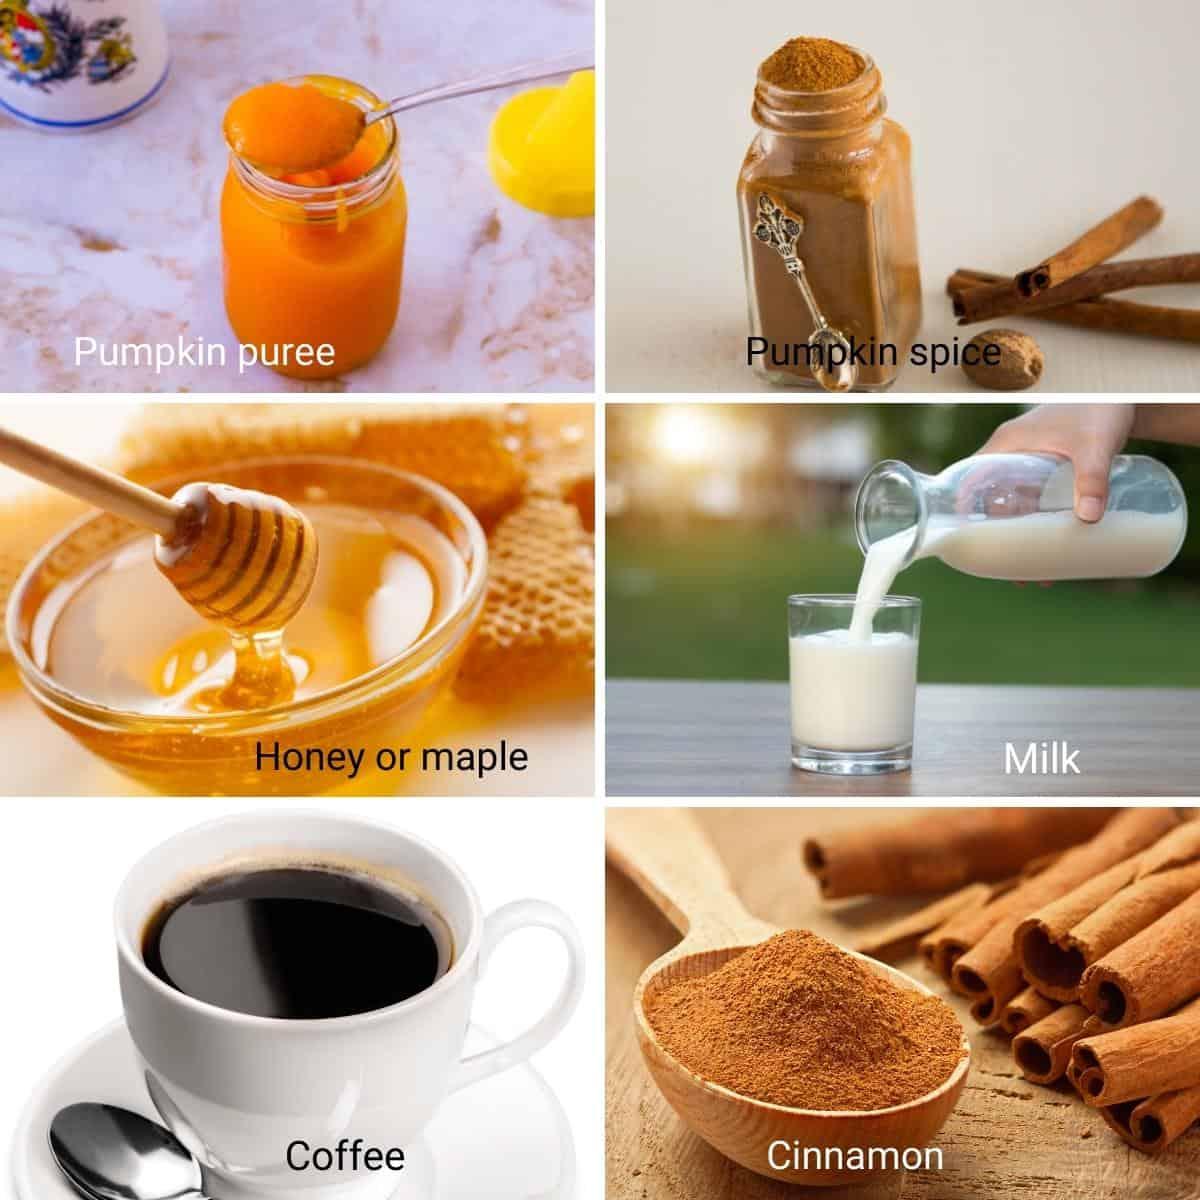 Ingredients for pumpkin spice latte.